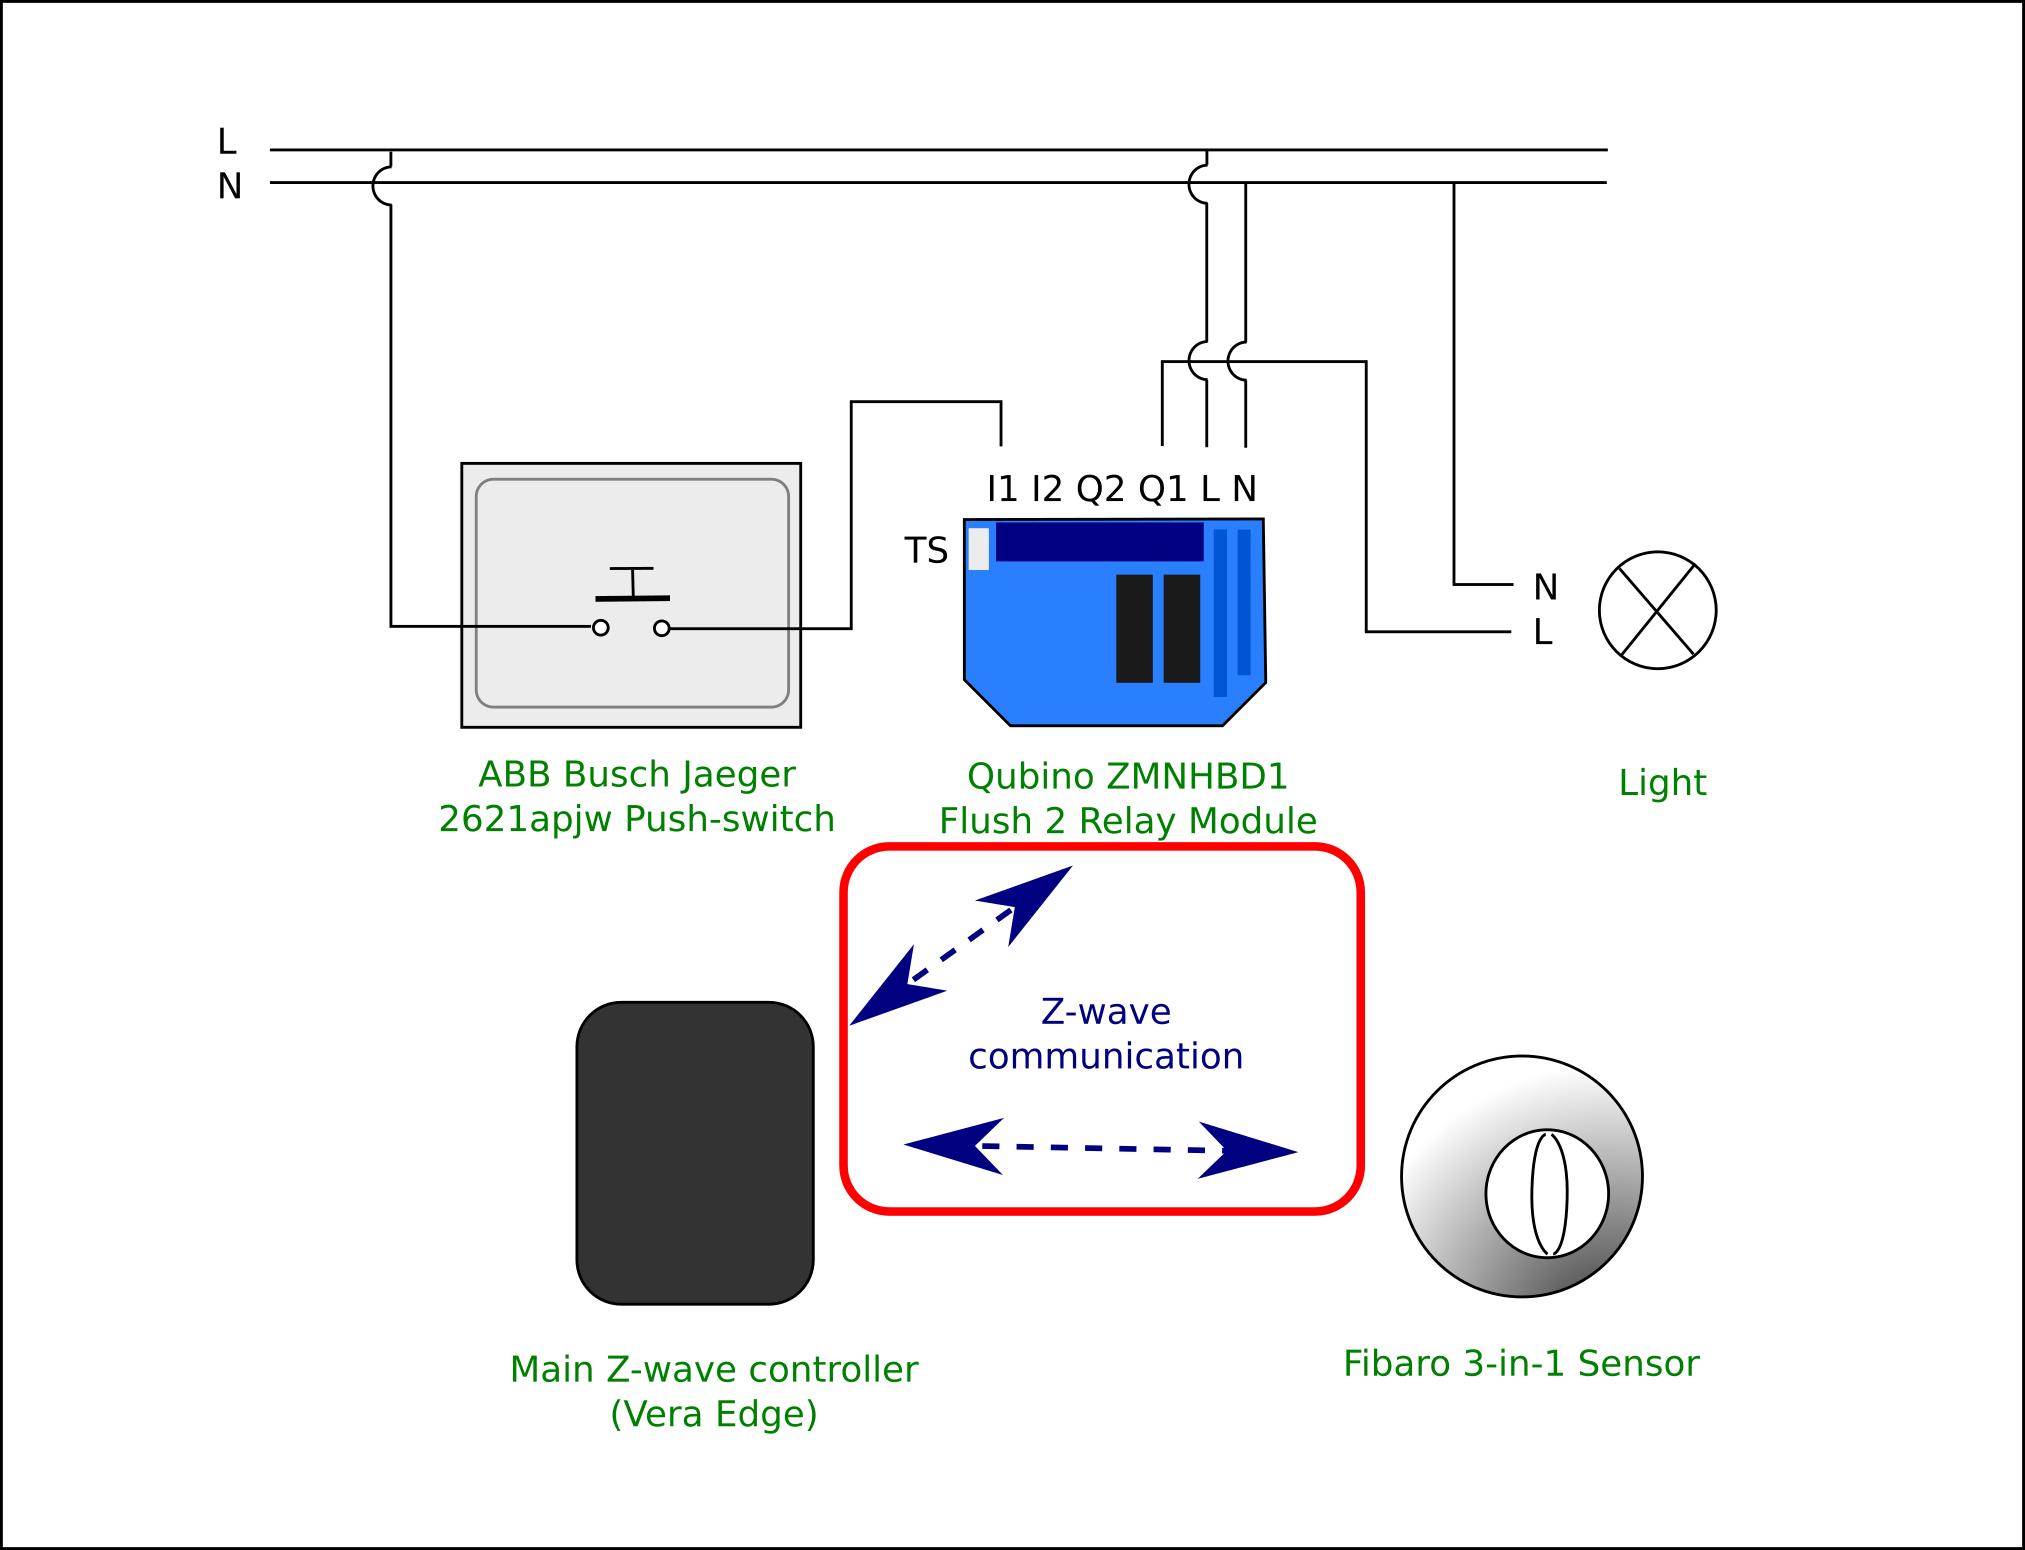 electrical-diagram-light-and-fibaro-3-in-1-sensor-selection7